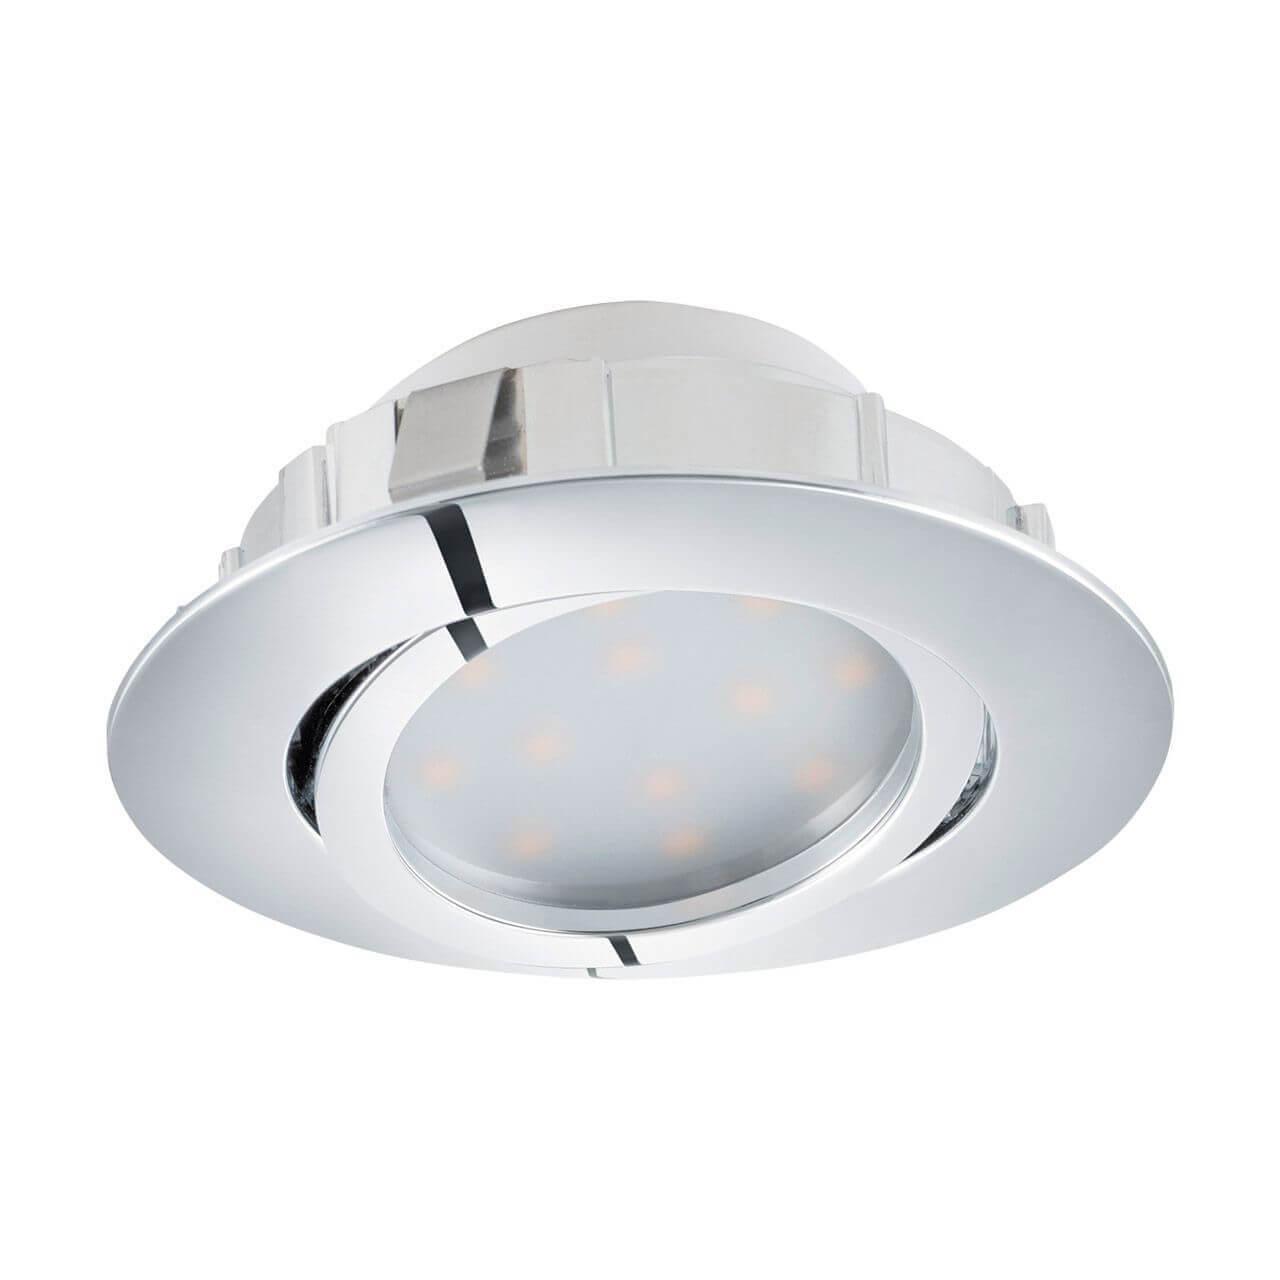 Светильник Eglo 95848 Pineda